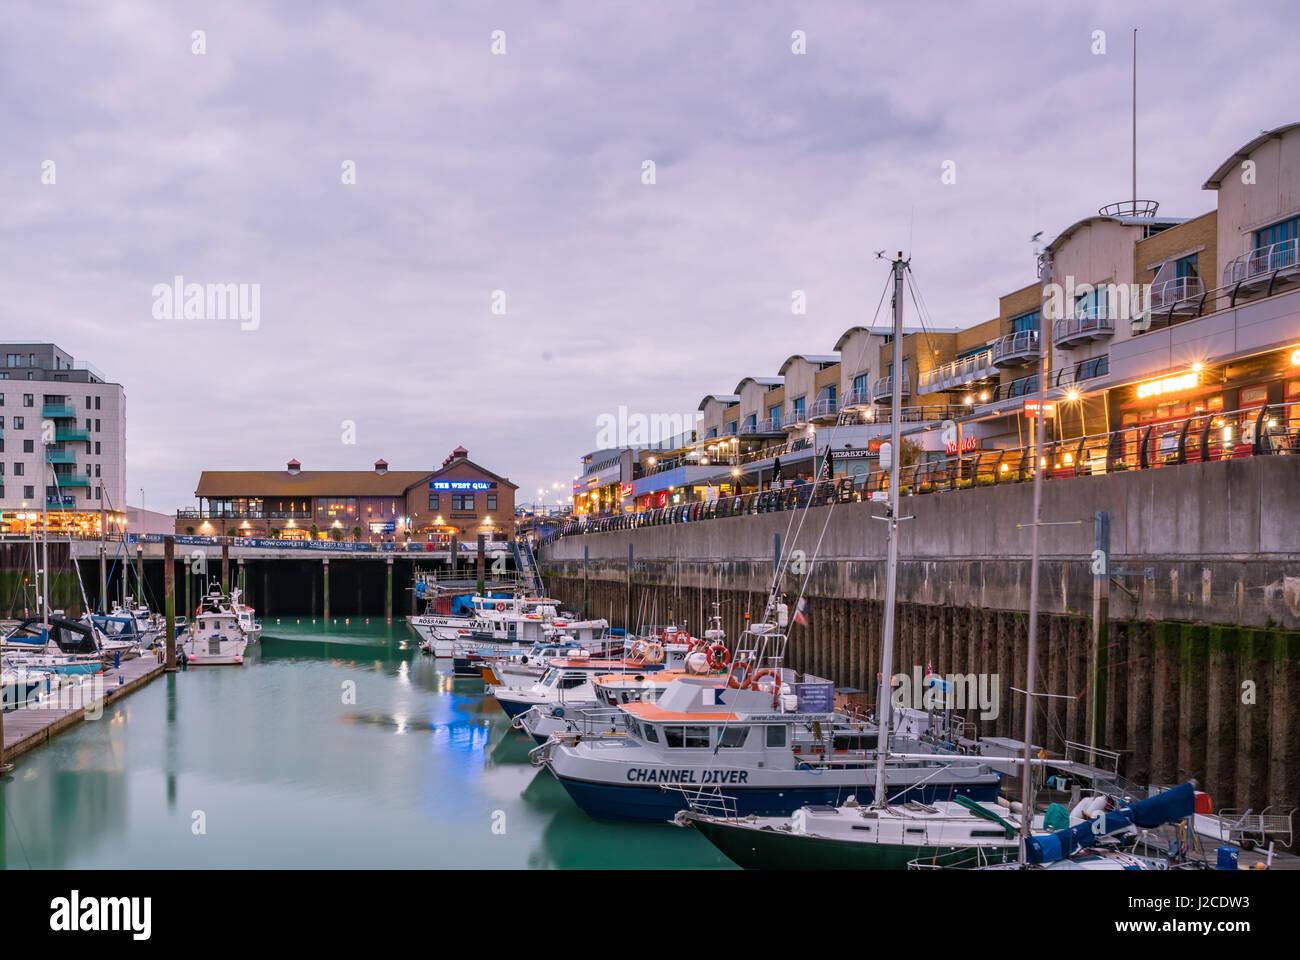 Brighton, England. 13 April 2017.Boats, yachts, and fishing boats moored at Brighton Marina docs on a cloudy day. Stock Photo